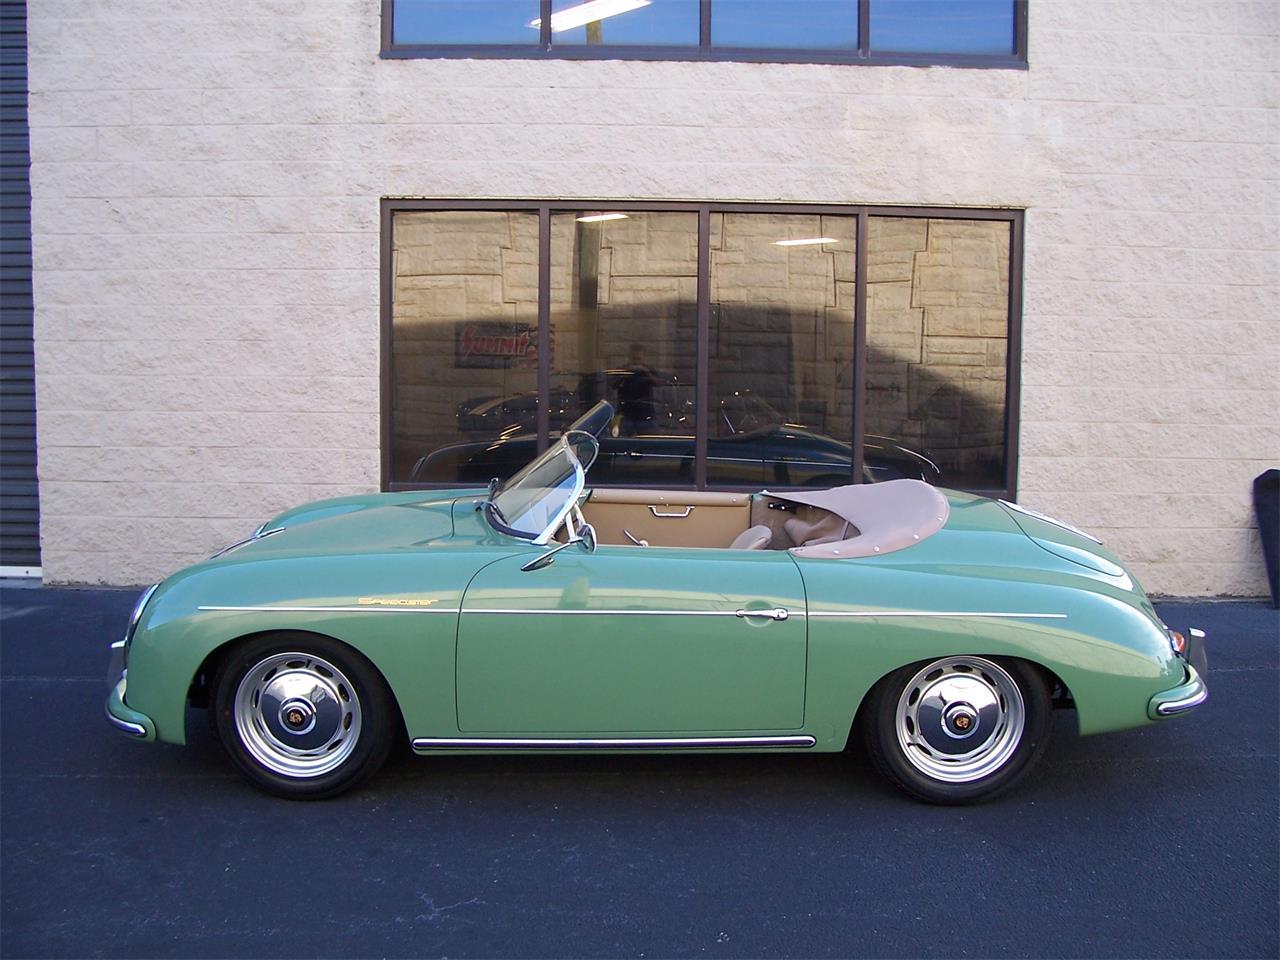 1957 Porsche 356 (CC-1300712) for sale in Alpharetta, Georgia